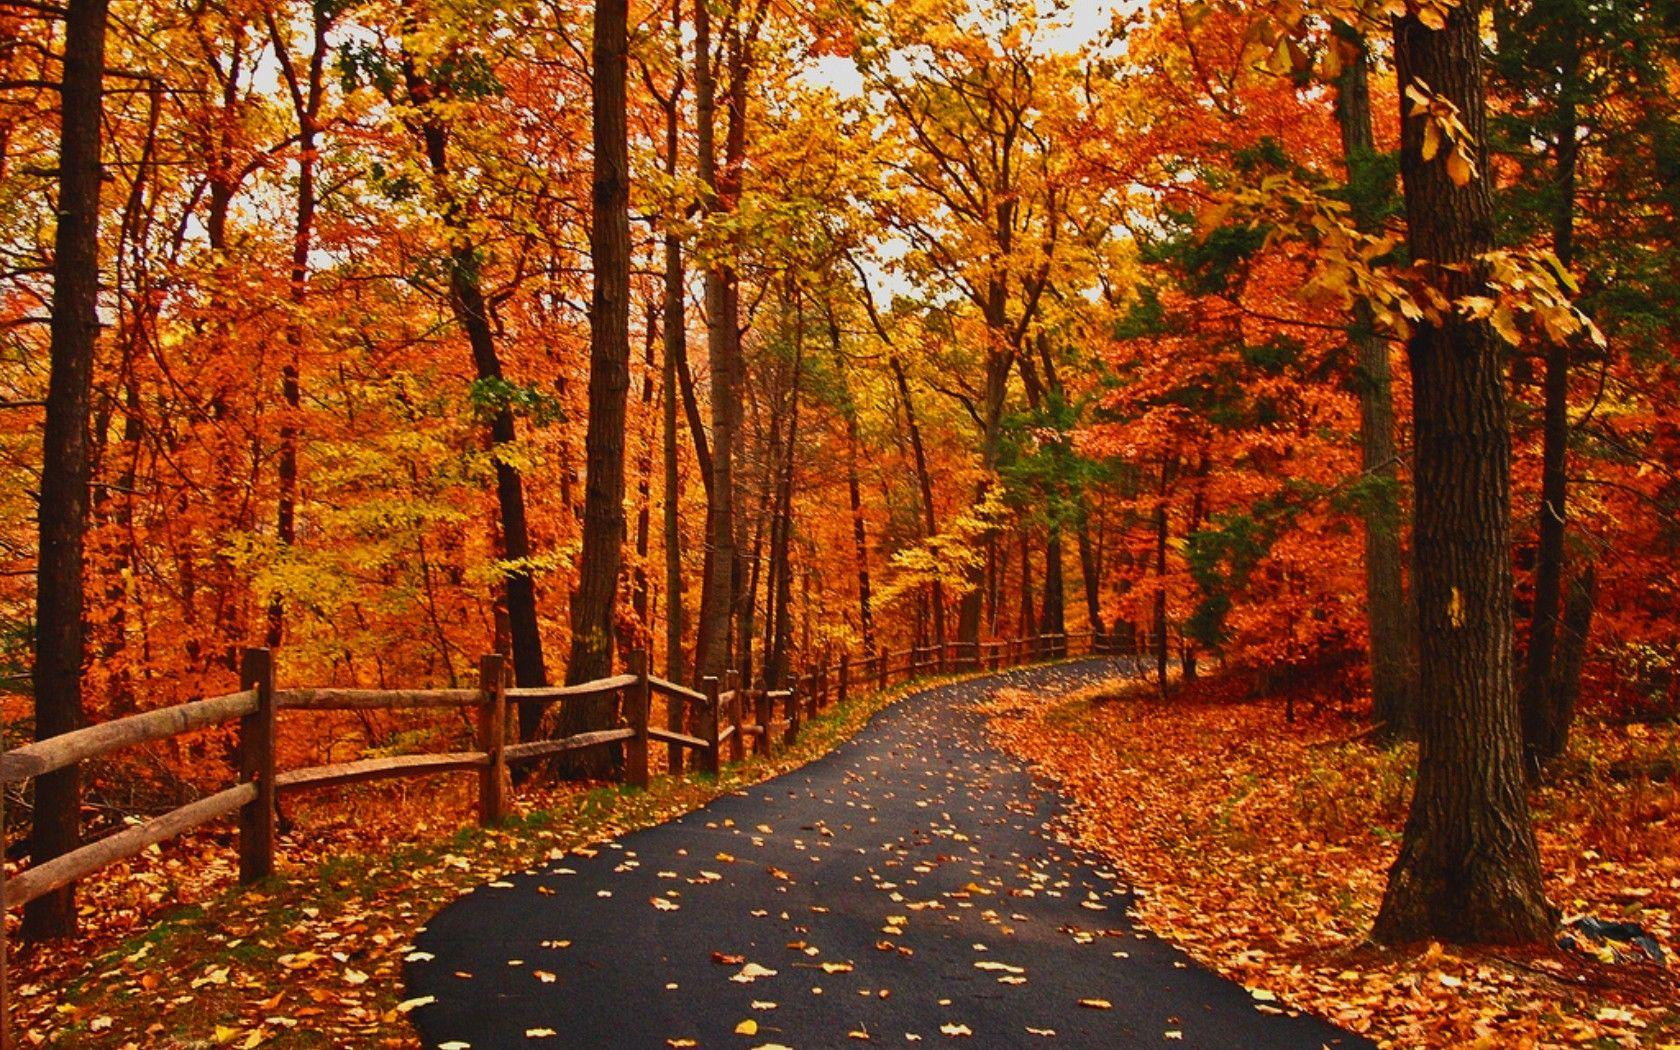 Autumn Walk through the Woods